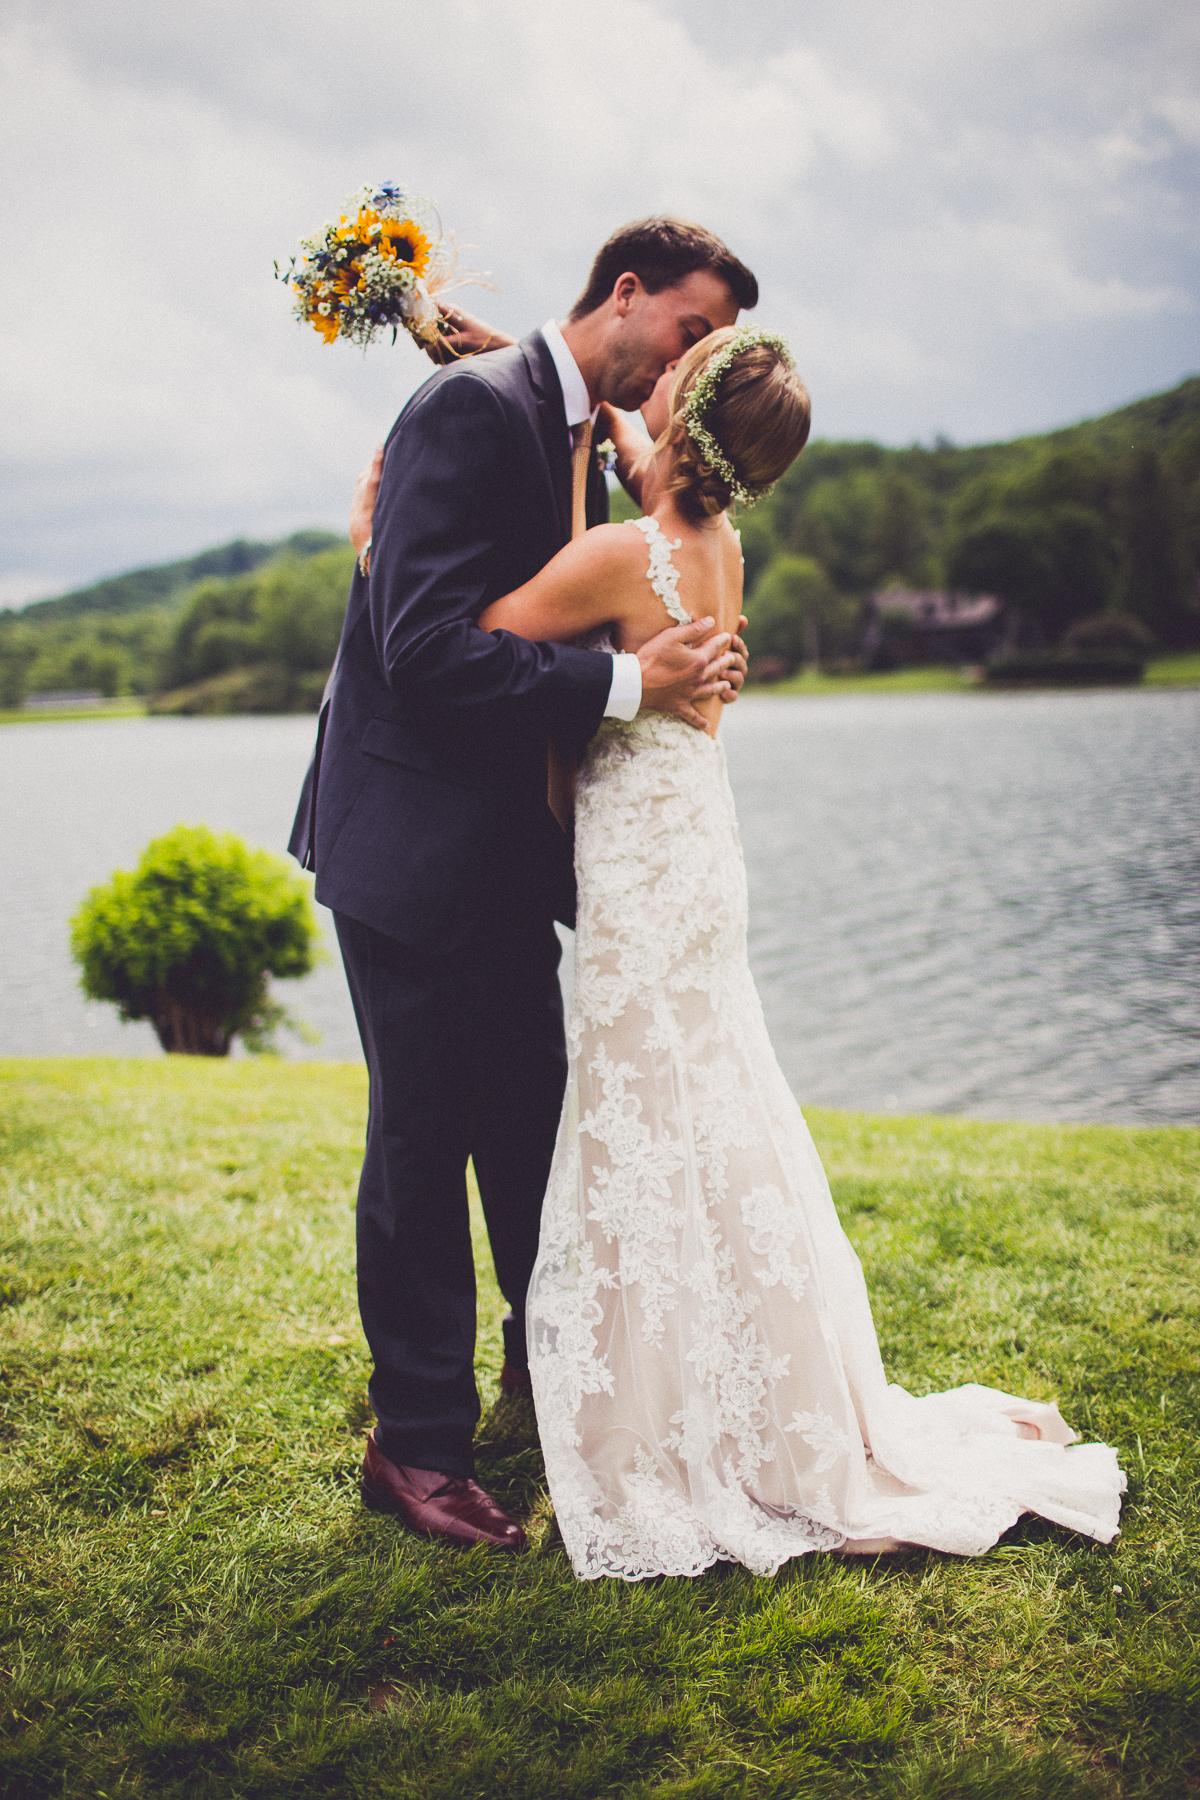 taylor-travis-grandfather-mountain-kelley-raye-north-carolina-wedding-photographer-36.jpg